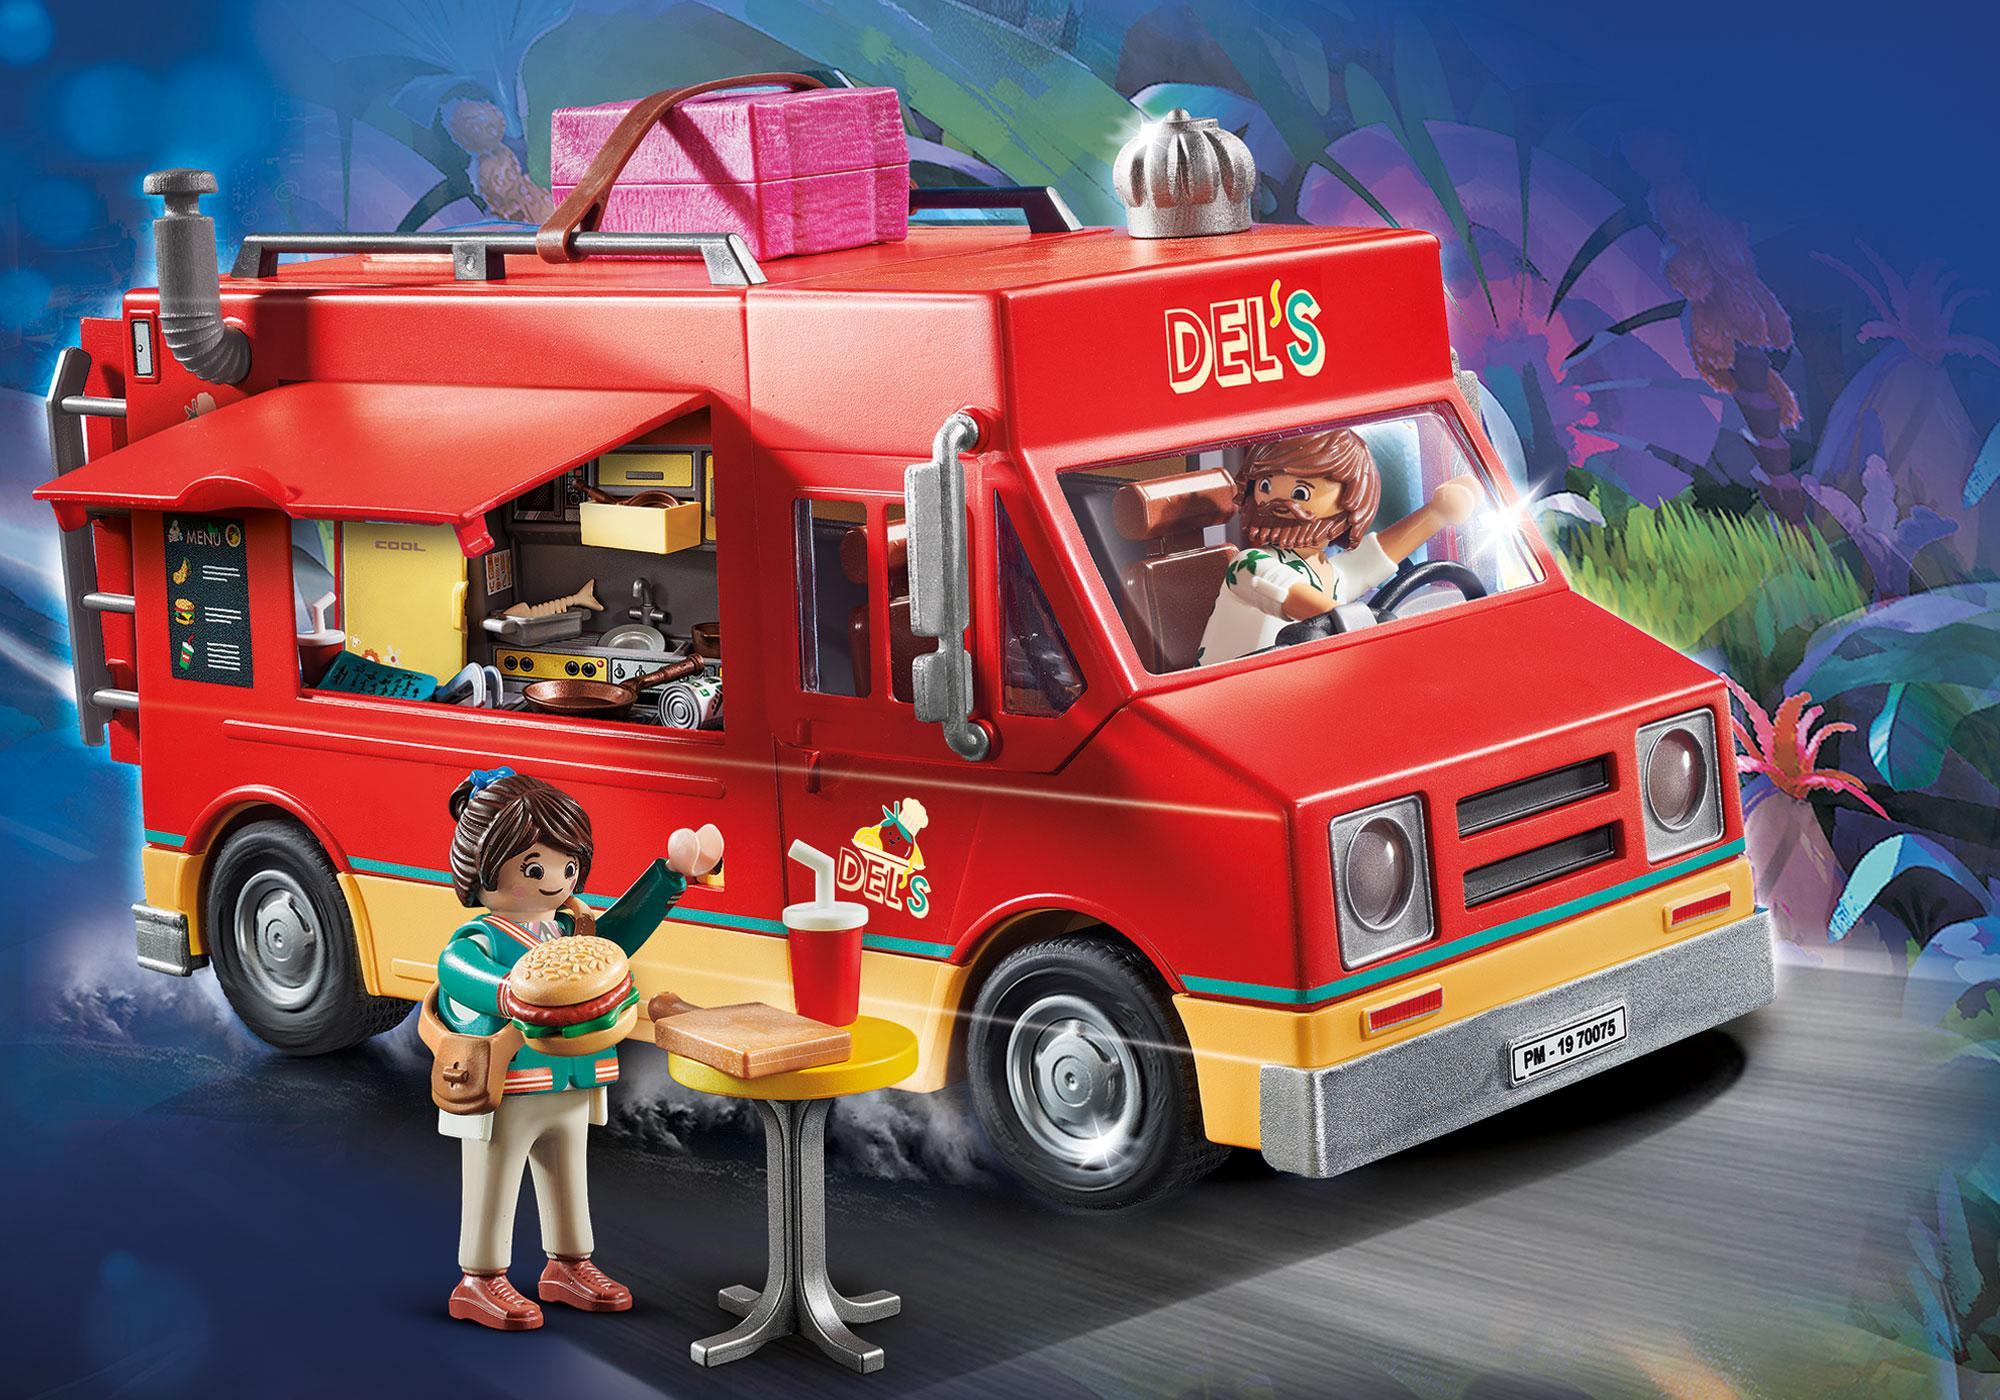 http://media.playmobil.com/i/playmobil/70075_product_detail/PLAYMOBIL: THE MOVIE Food Truck Del